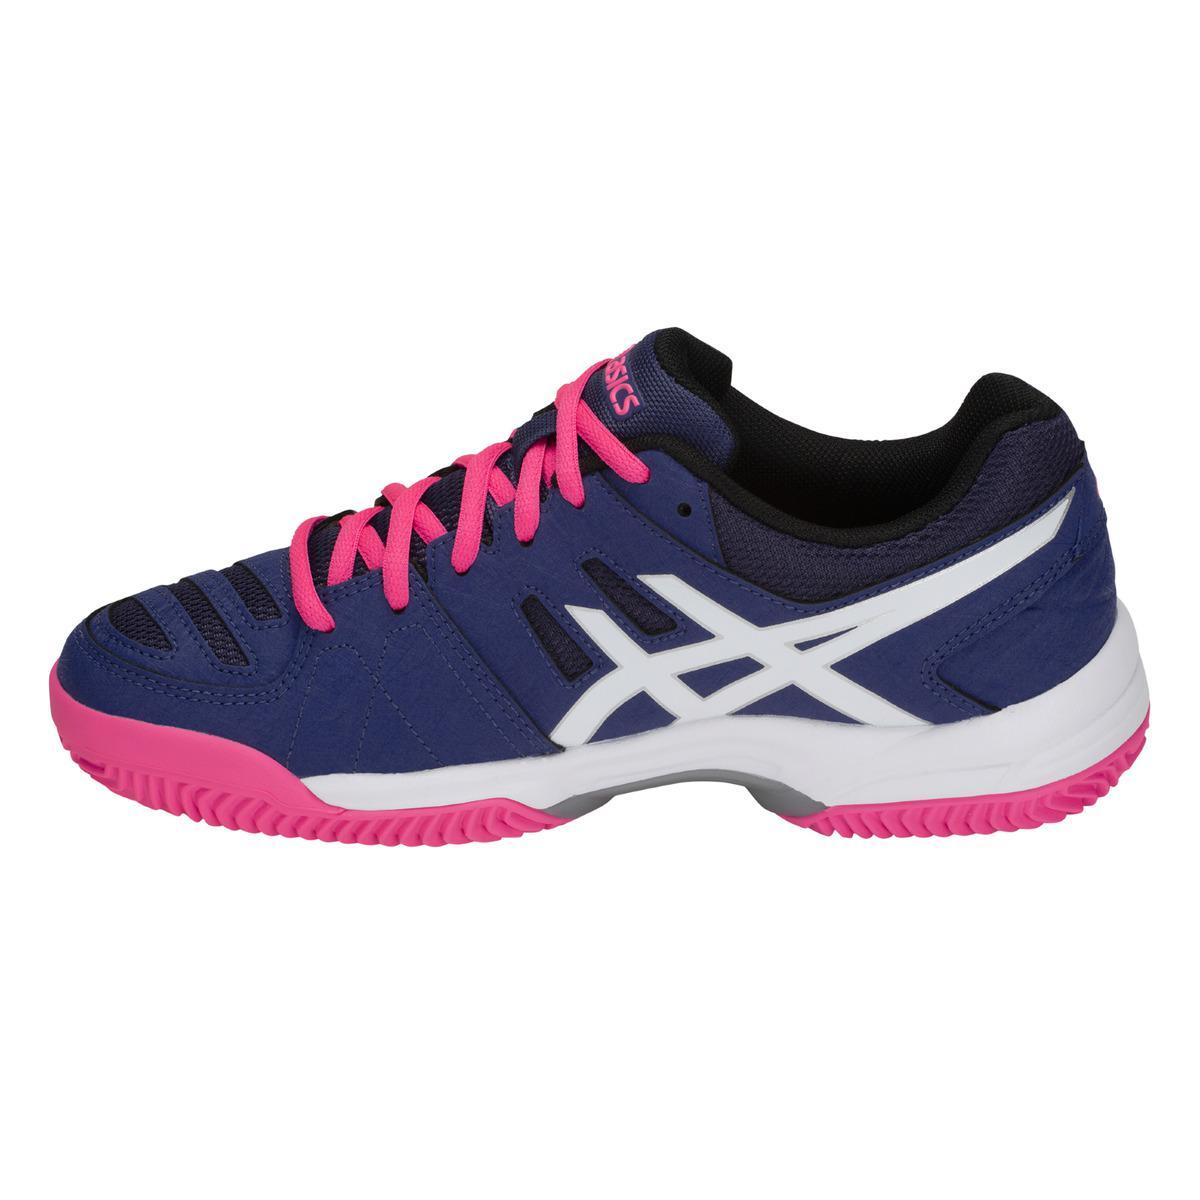 007de63db044 Asics - Blue Gel-padel Pro 3 Sg Paddle Tennis Shoes - Lyst. View fullscreen